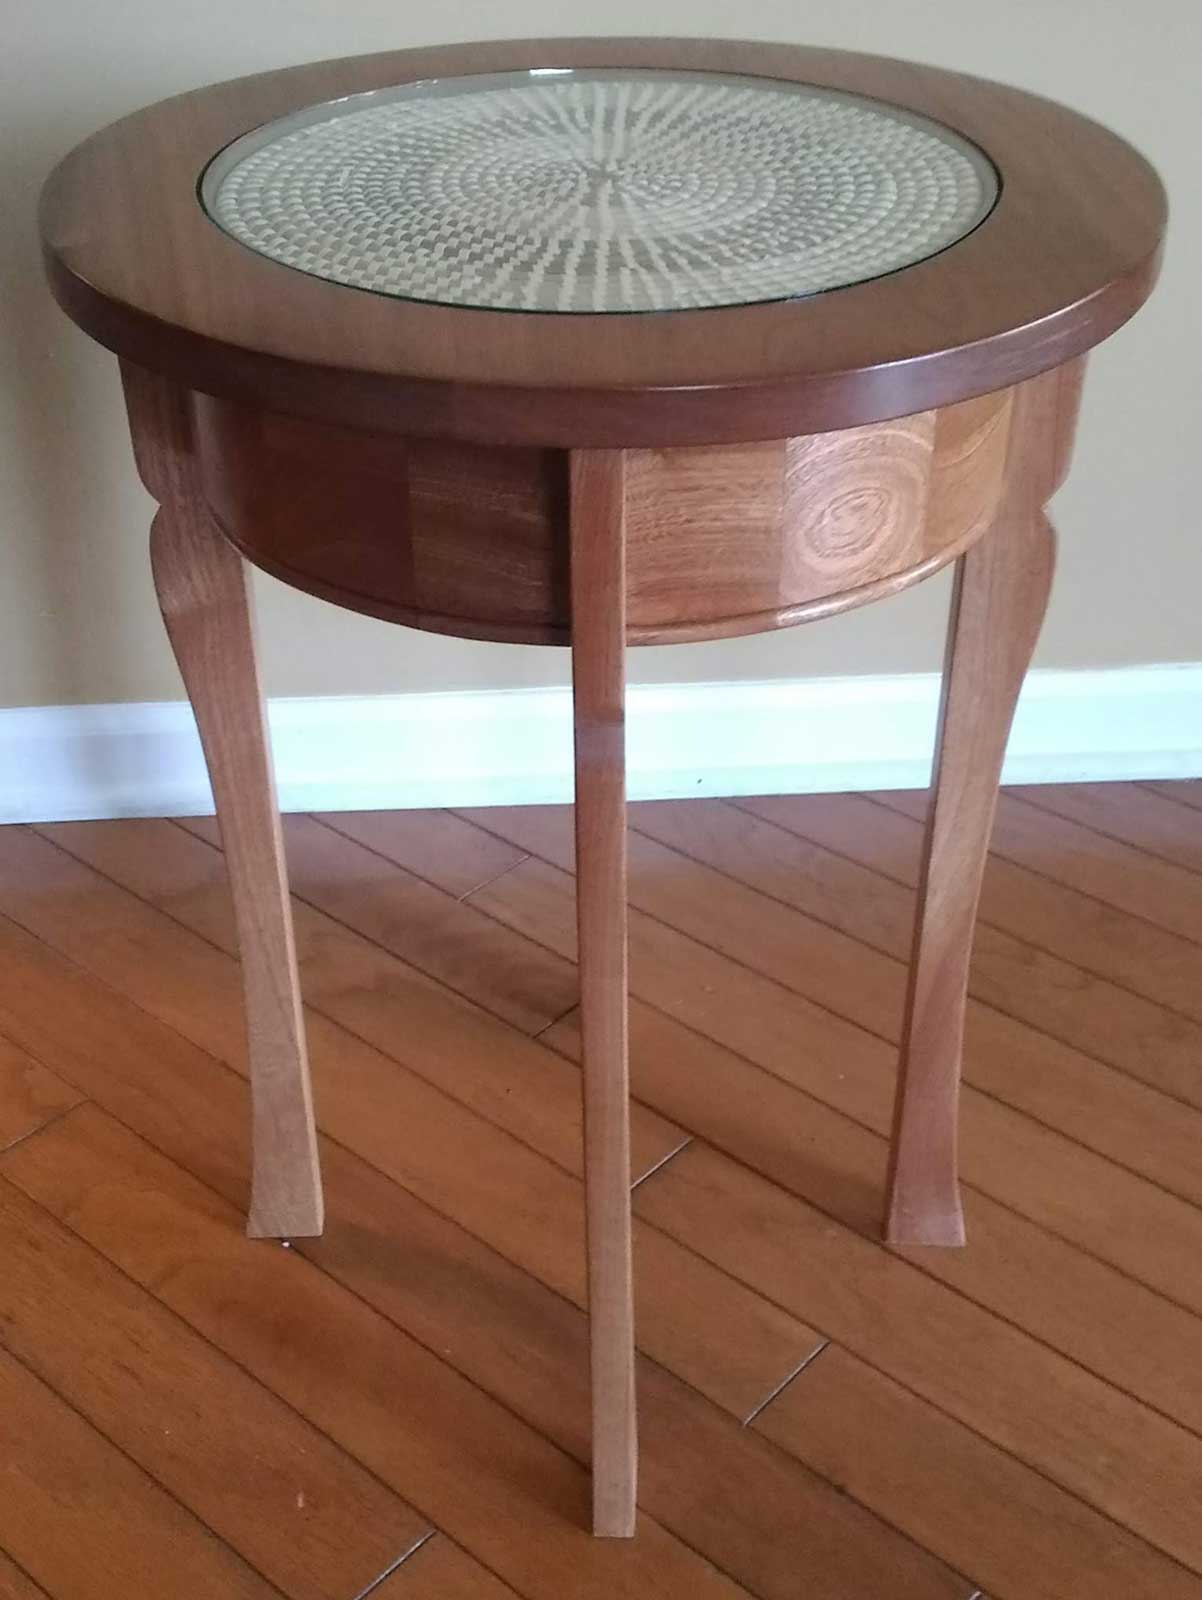 Pete Rock Sweet Grass Table #47 $1,000